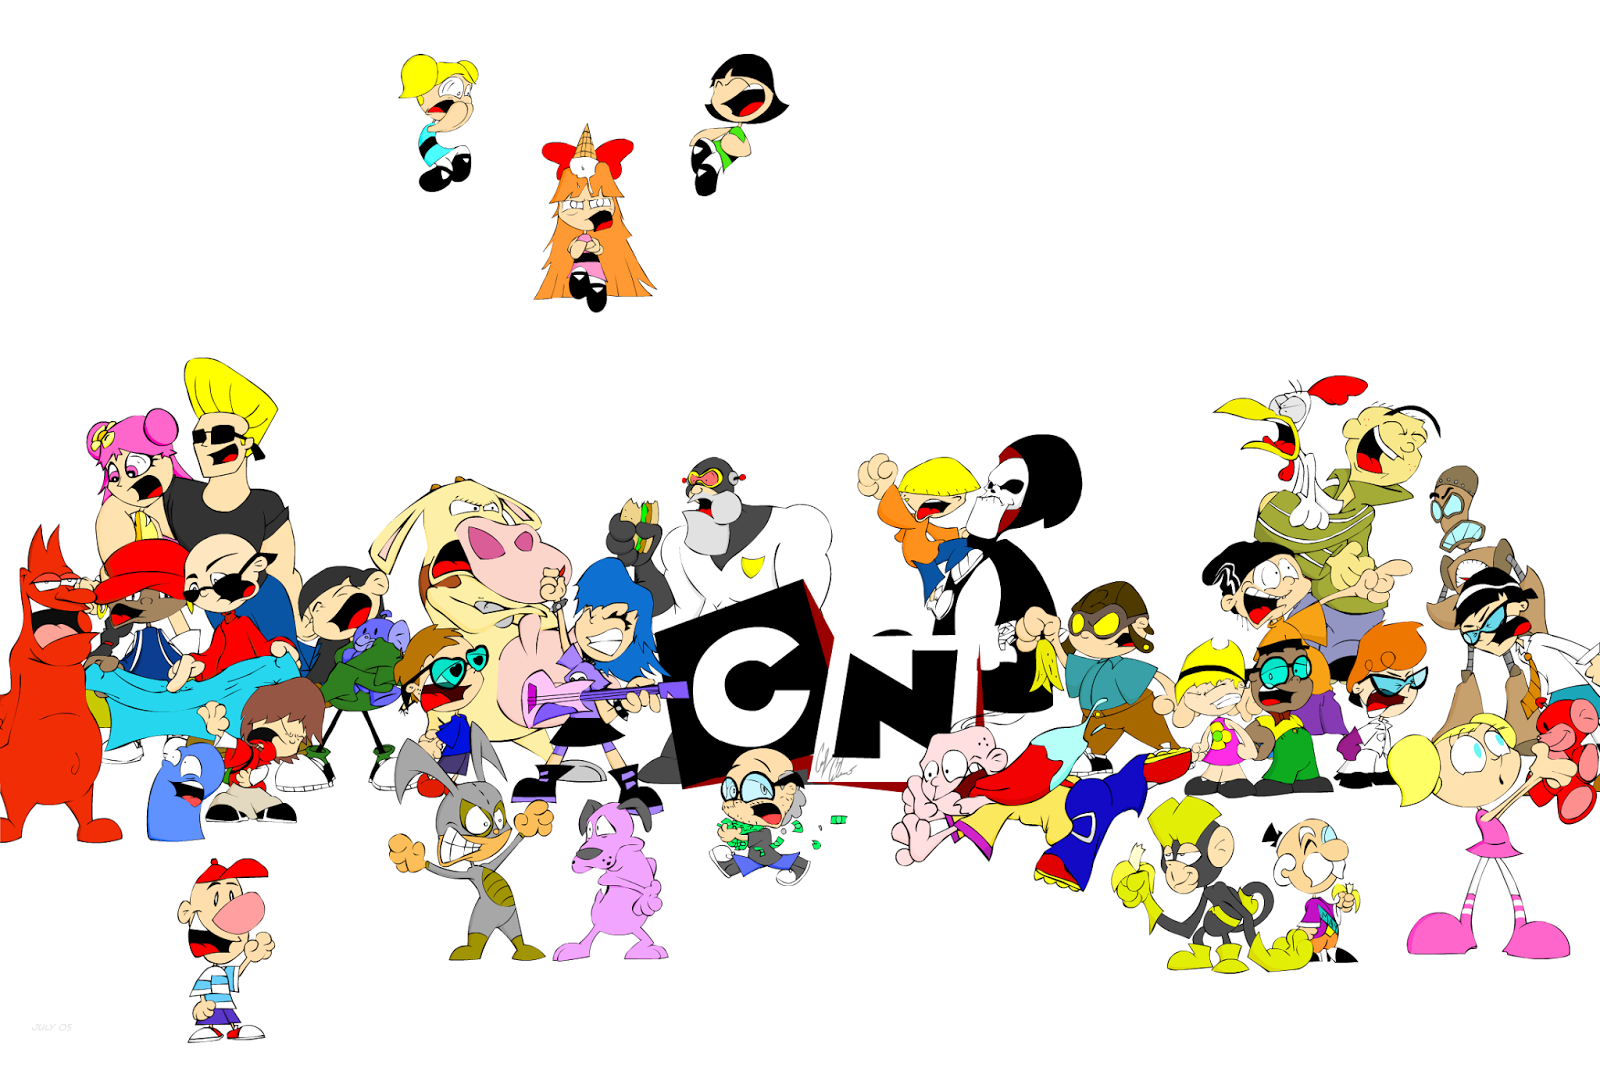 Cartoon Name: Cartoon Network Characters